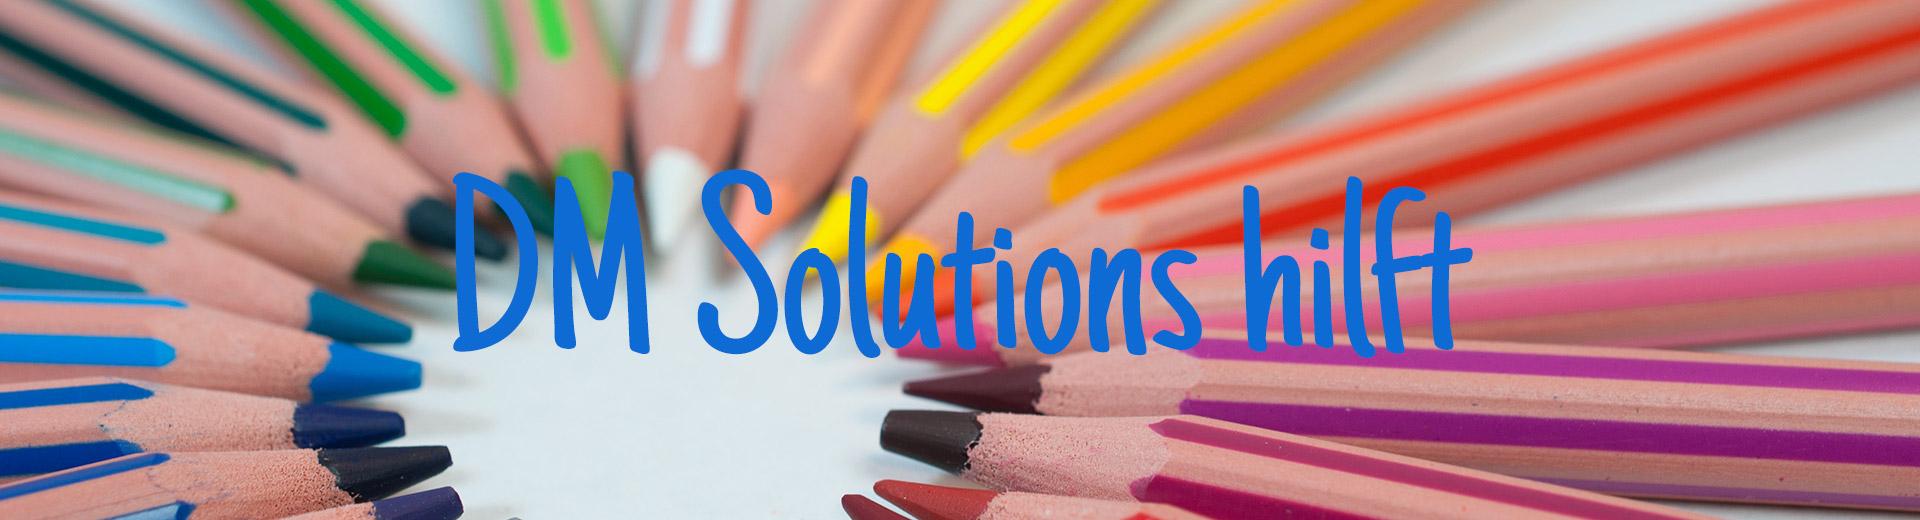 DM Solutions hilft